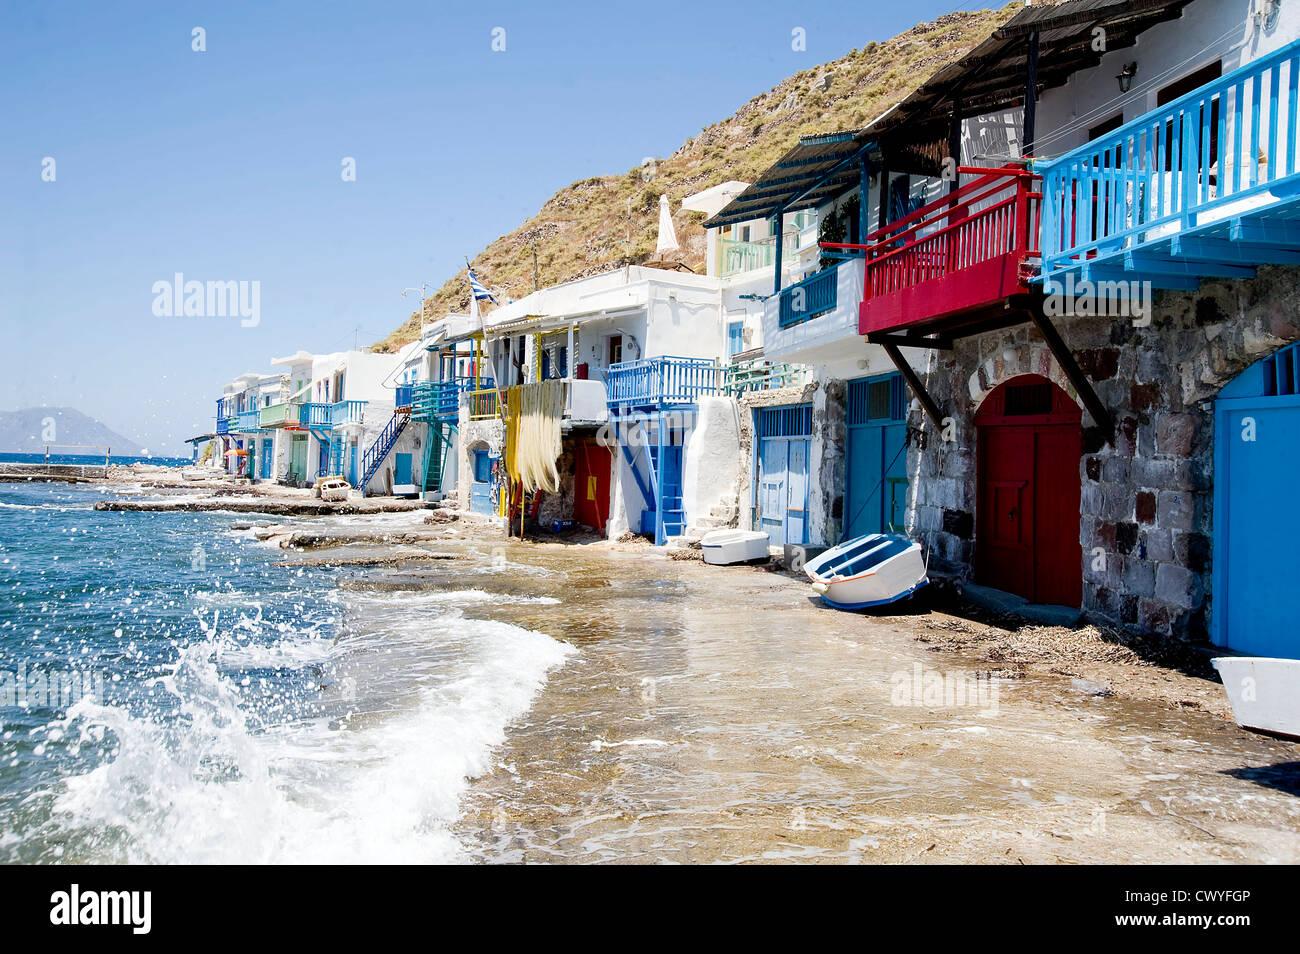 Fishing village Klima, Milos, Greece, Europe - Stock Image